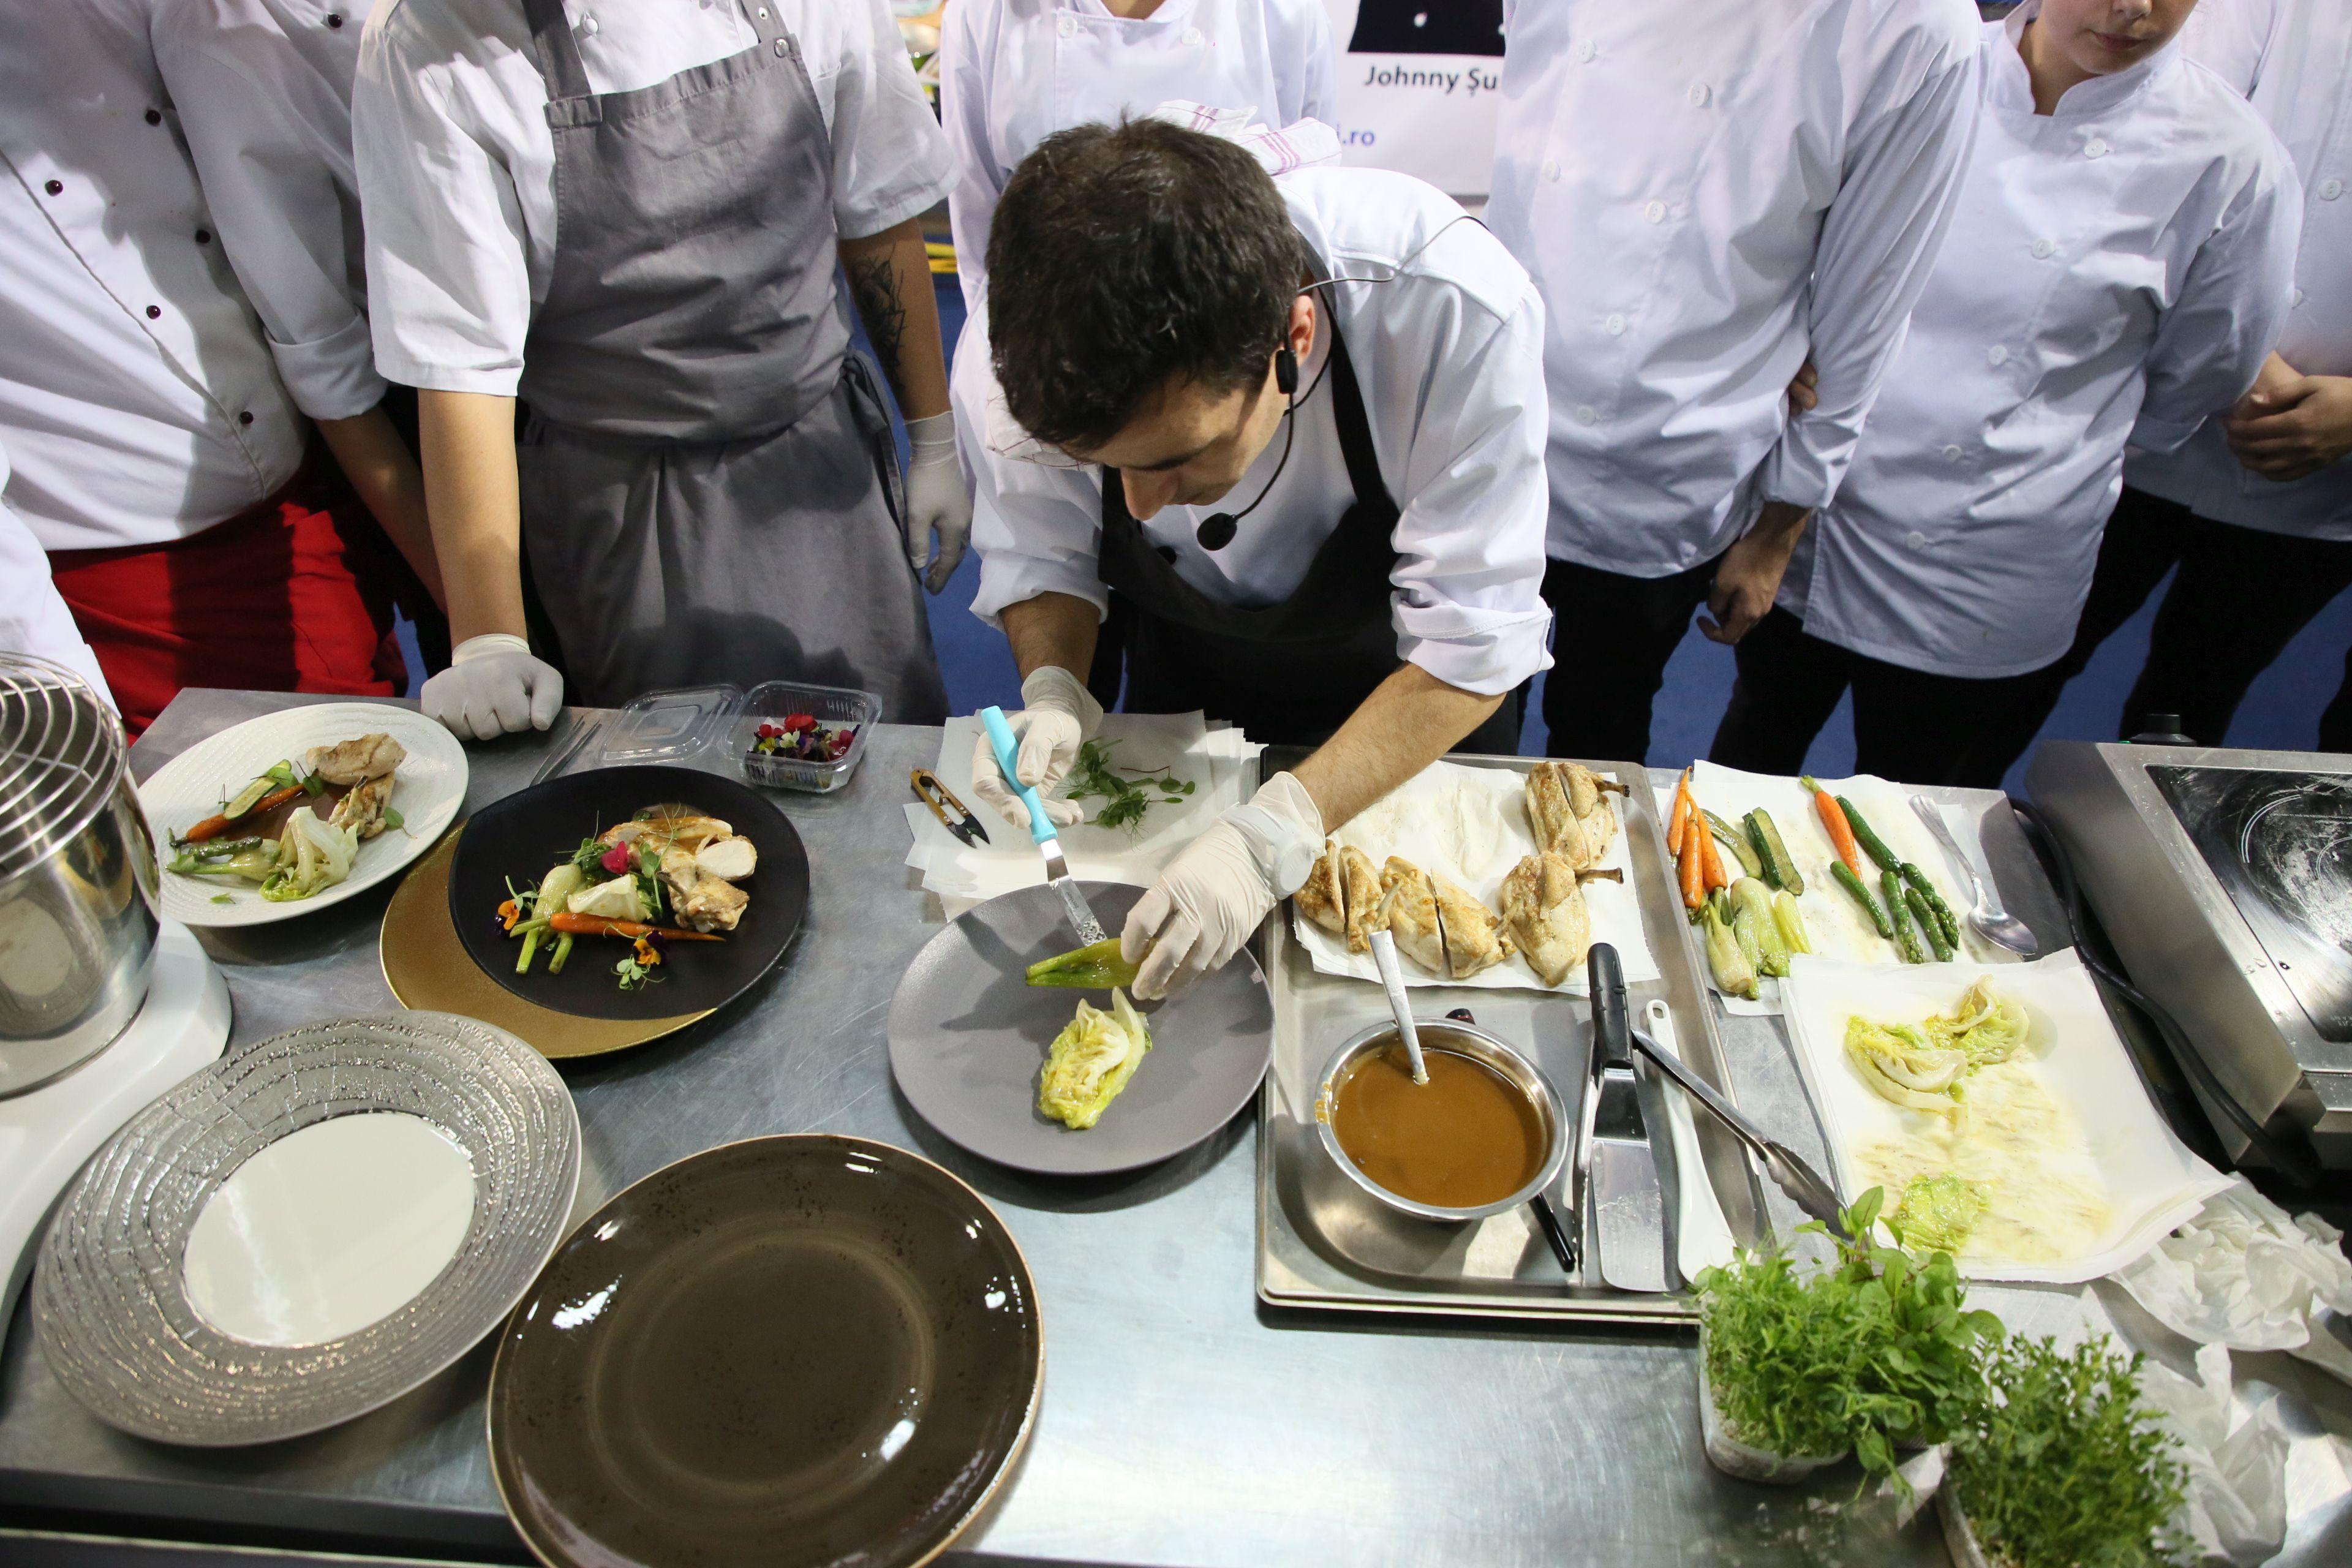 Sarbatoarea_Gustului_Chef_Johnny_Susala_Master_class_pui_coco_rico_20